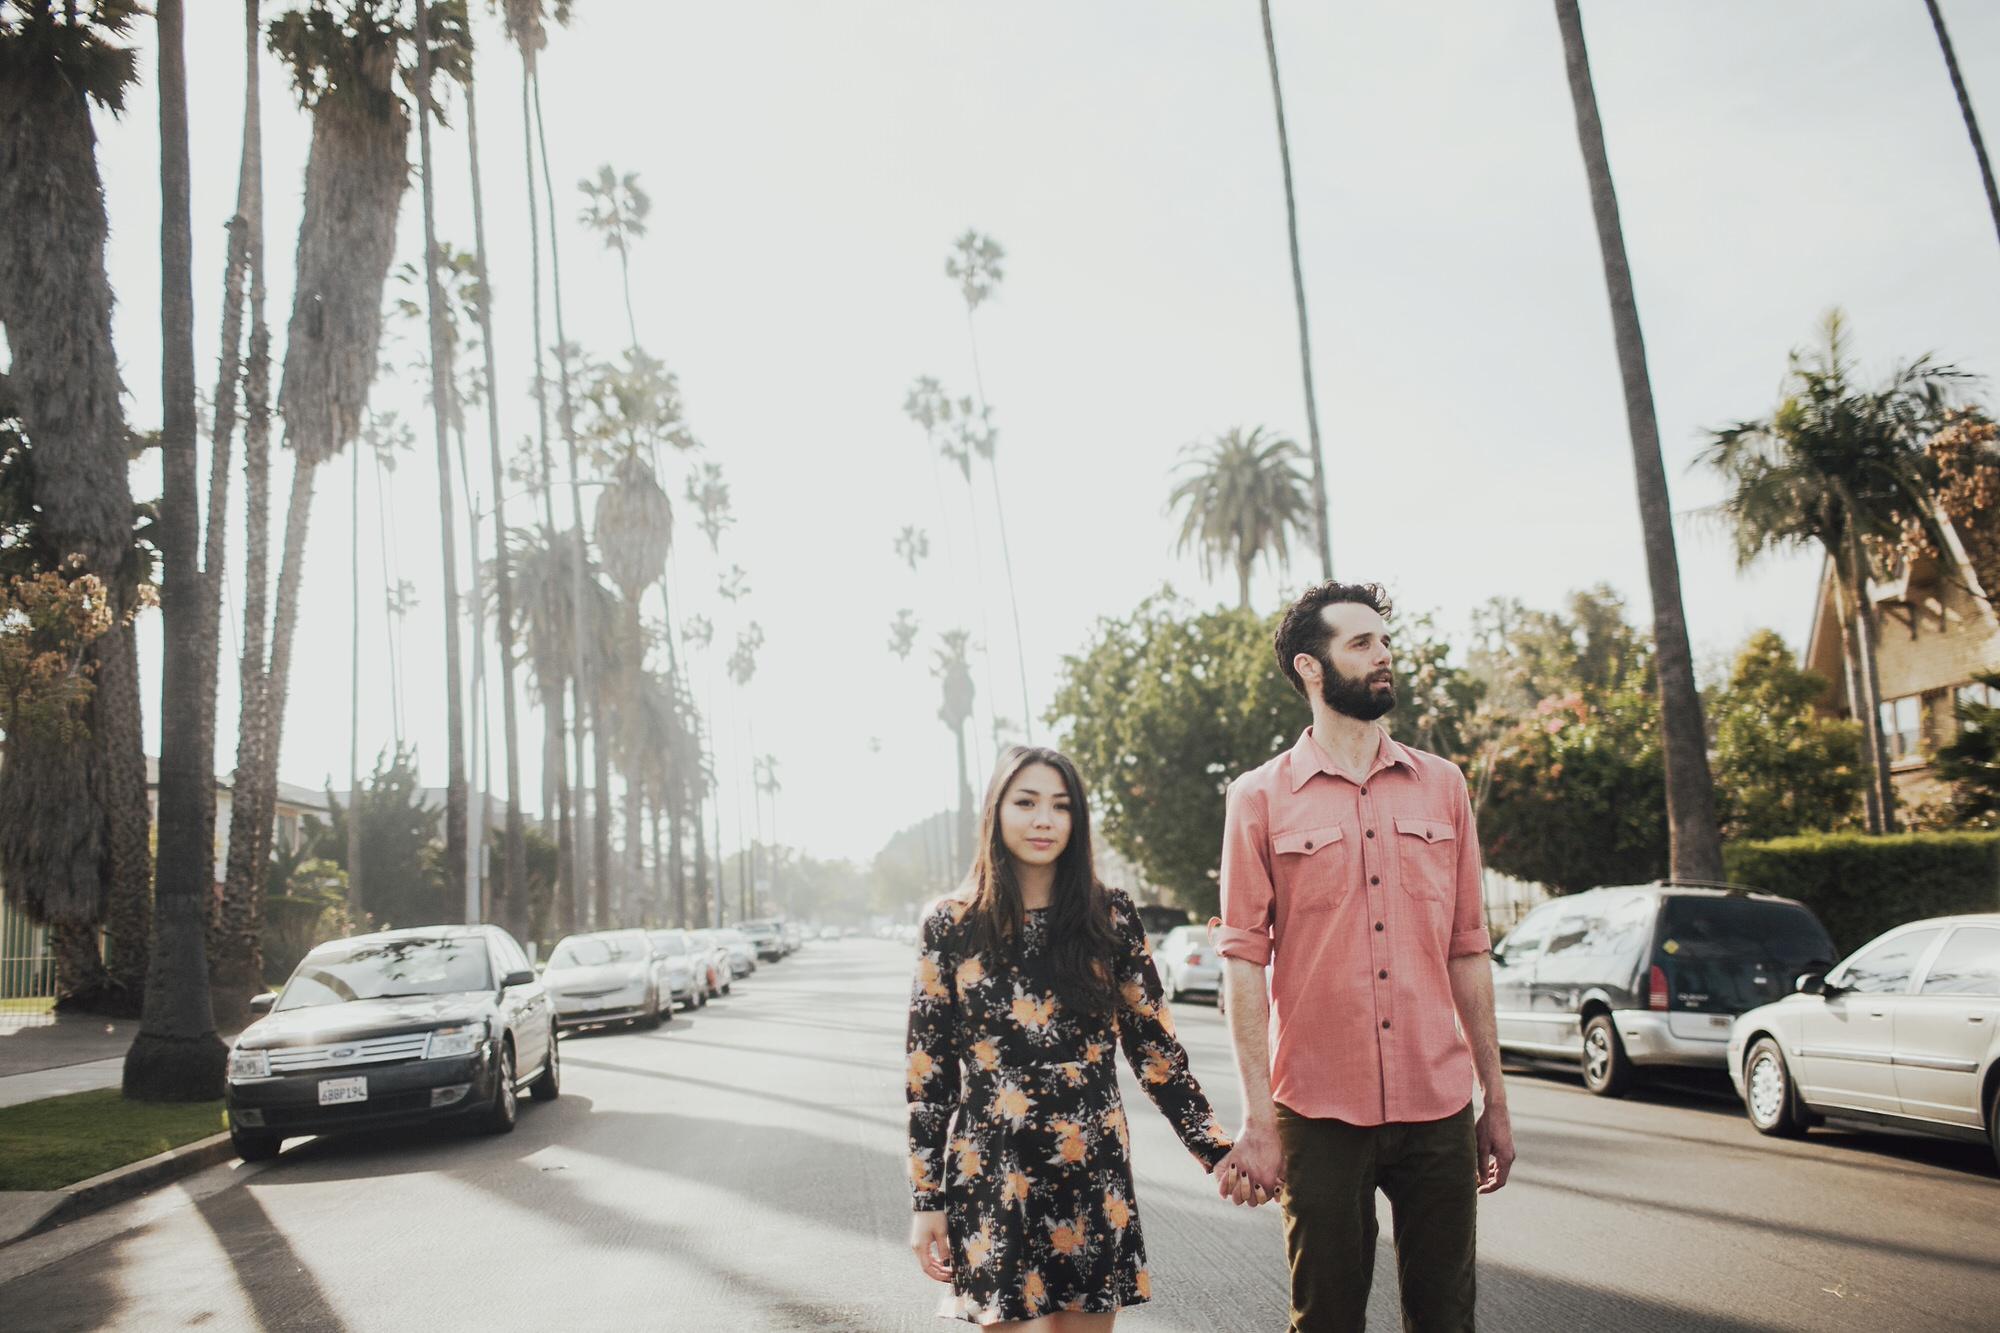 destination wedding photographer in california